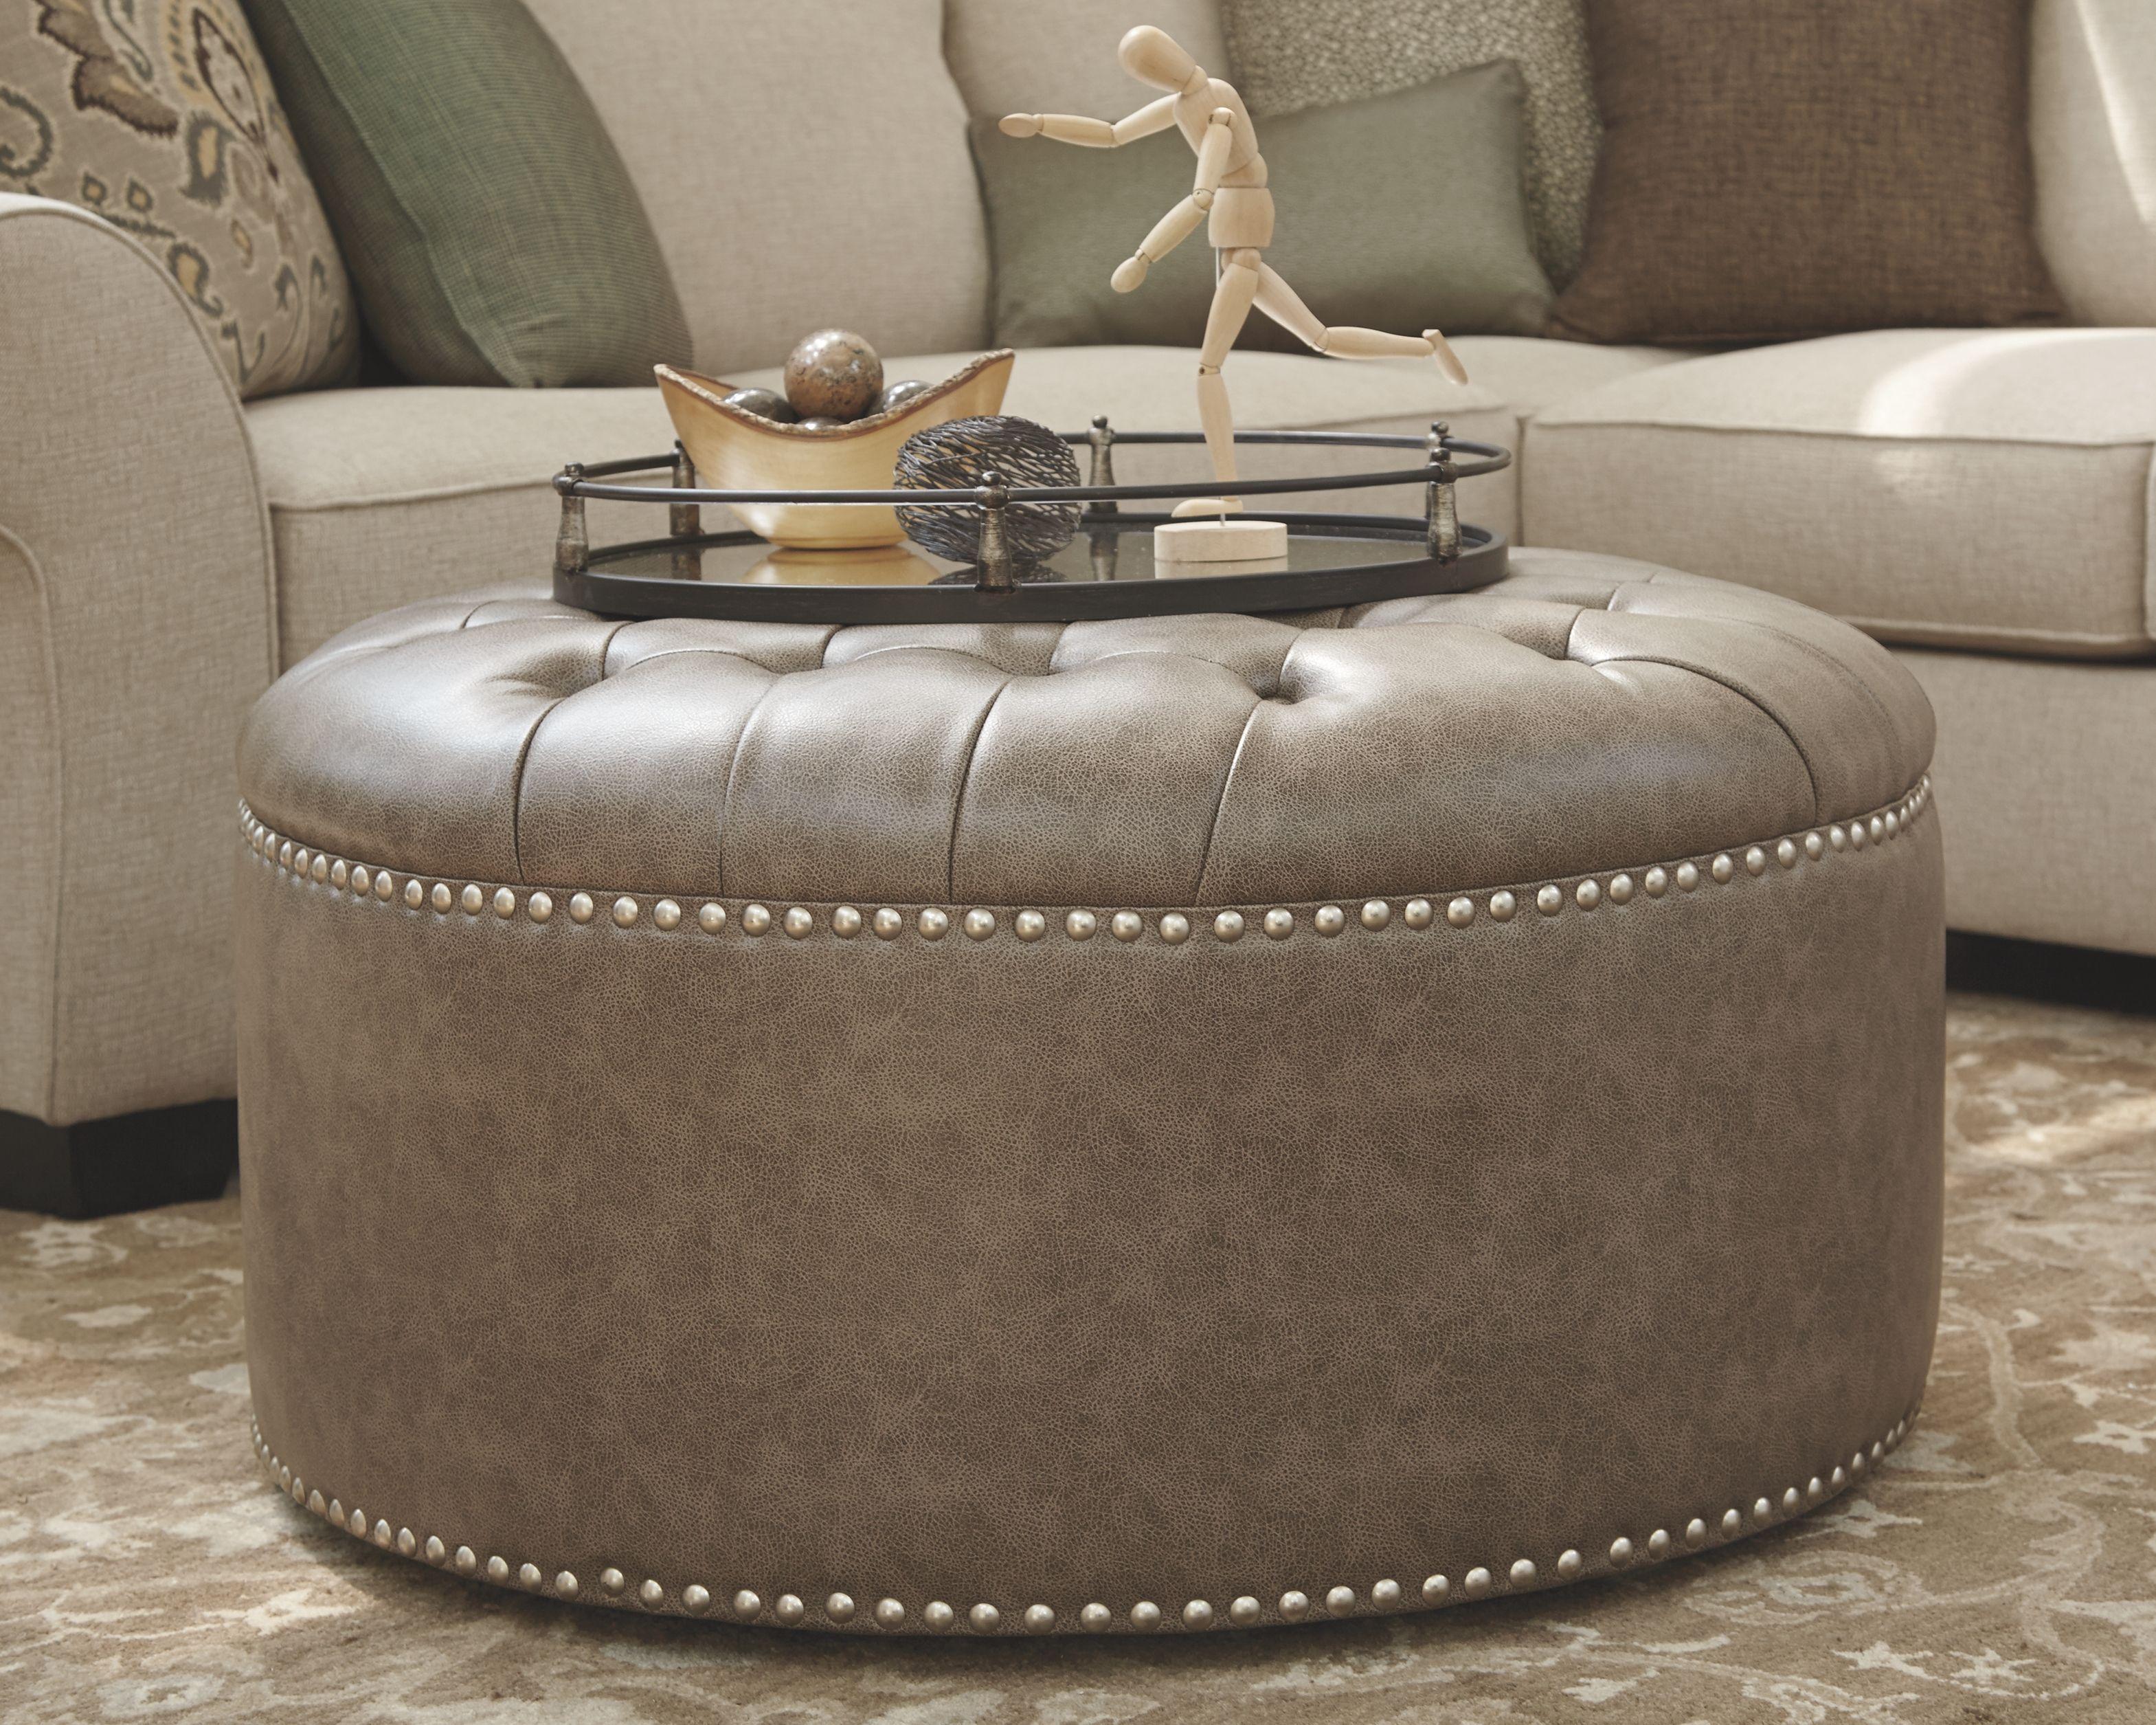 Wilcot Oversized Ottoman Ashley Furniture Homestore In 2021 Round Leather Ottoman Shoe Storage Ottoman Oversized Ottoman [ 2510 x 3138 Pixel ]